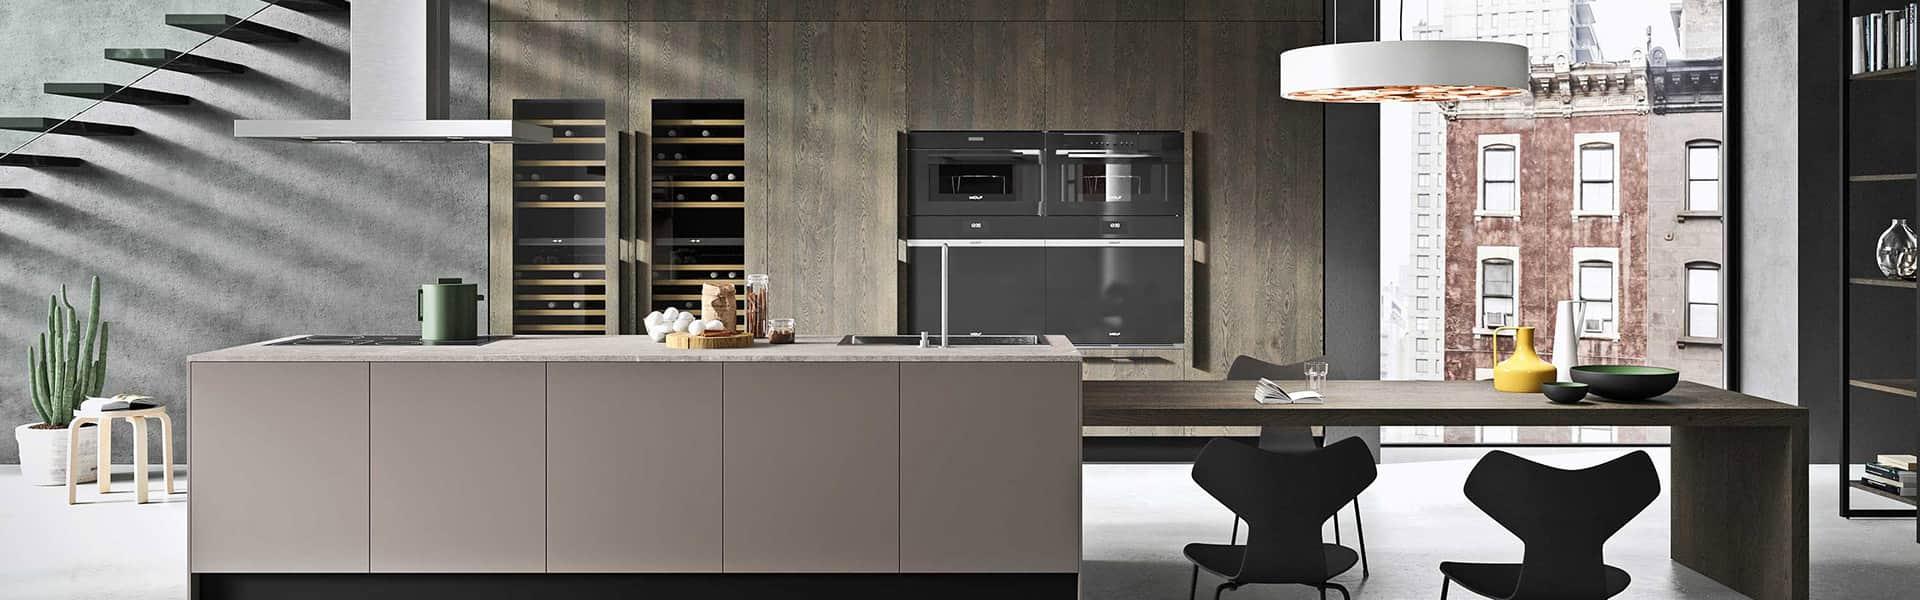 Cucina-Amaltea-Banner-Home